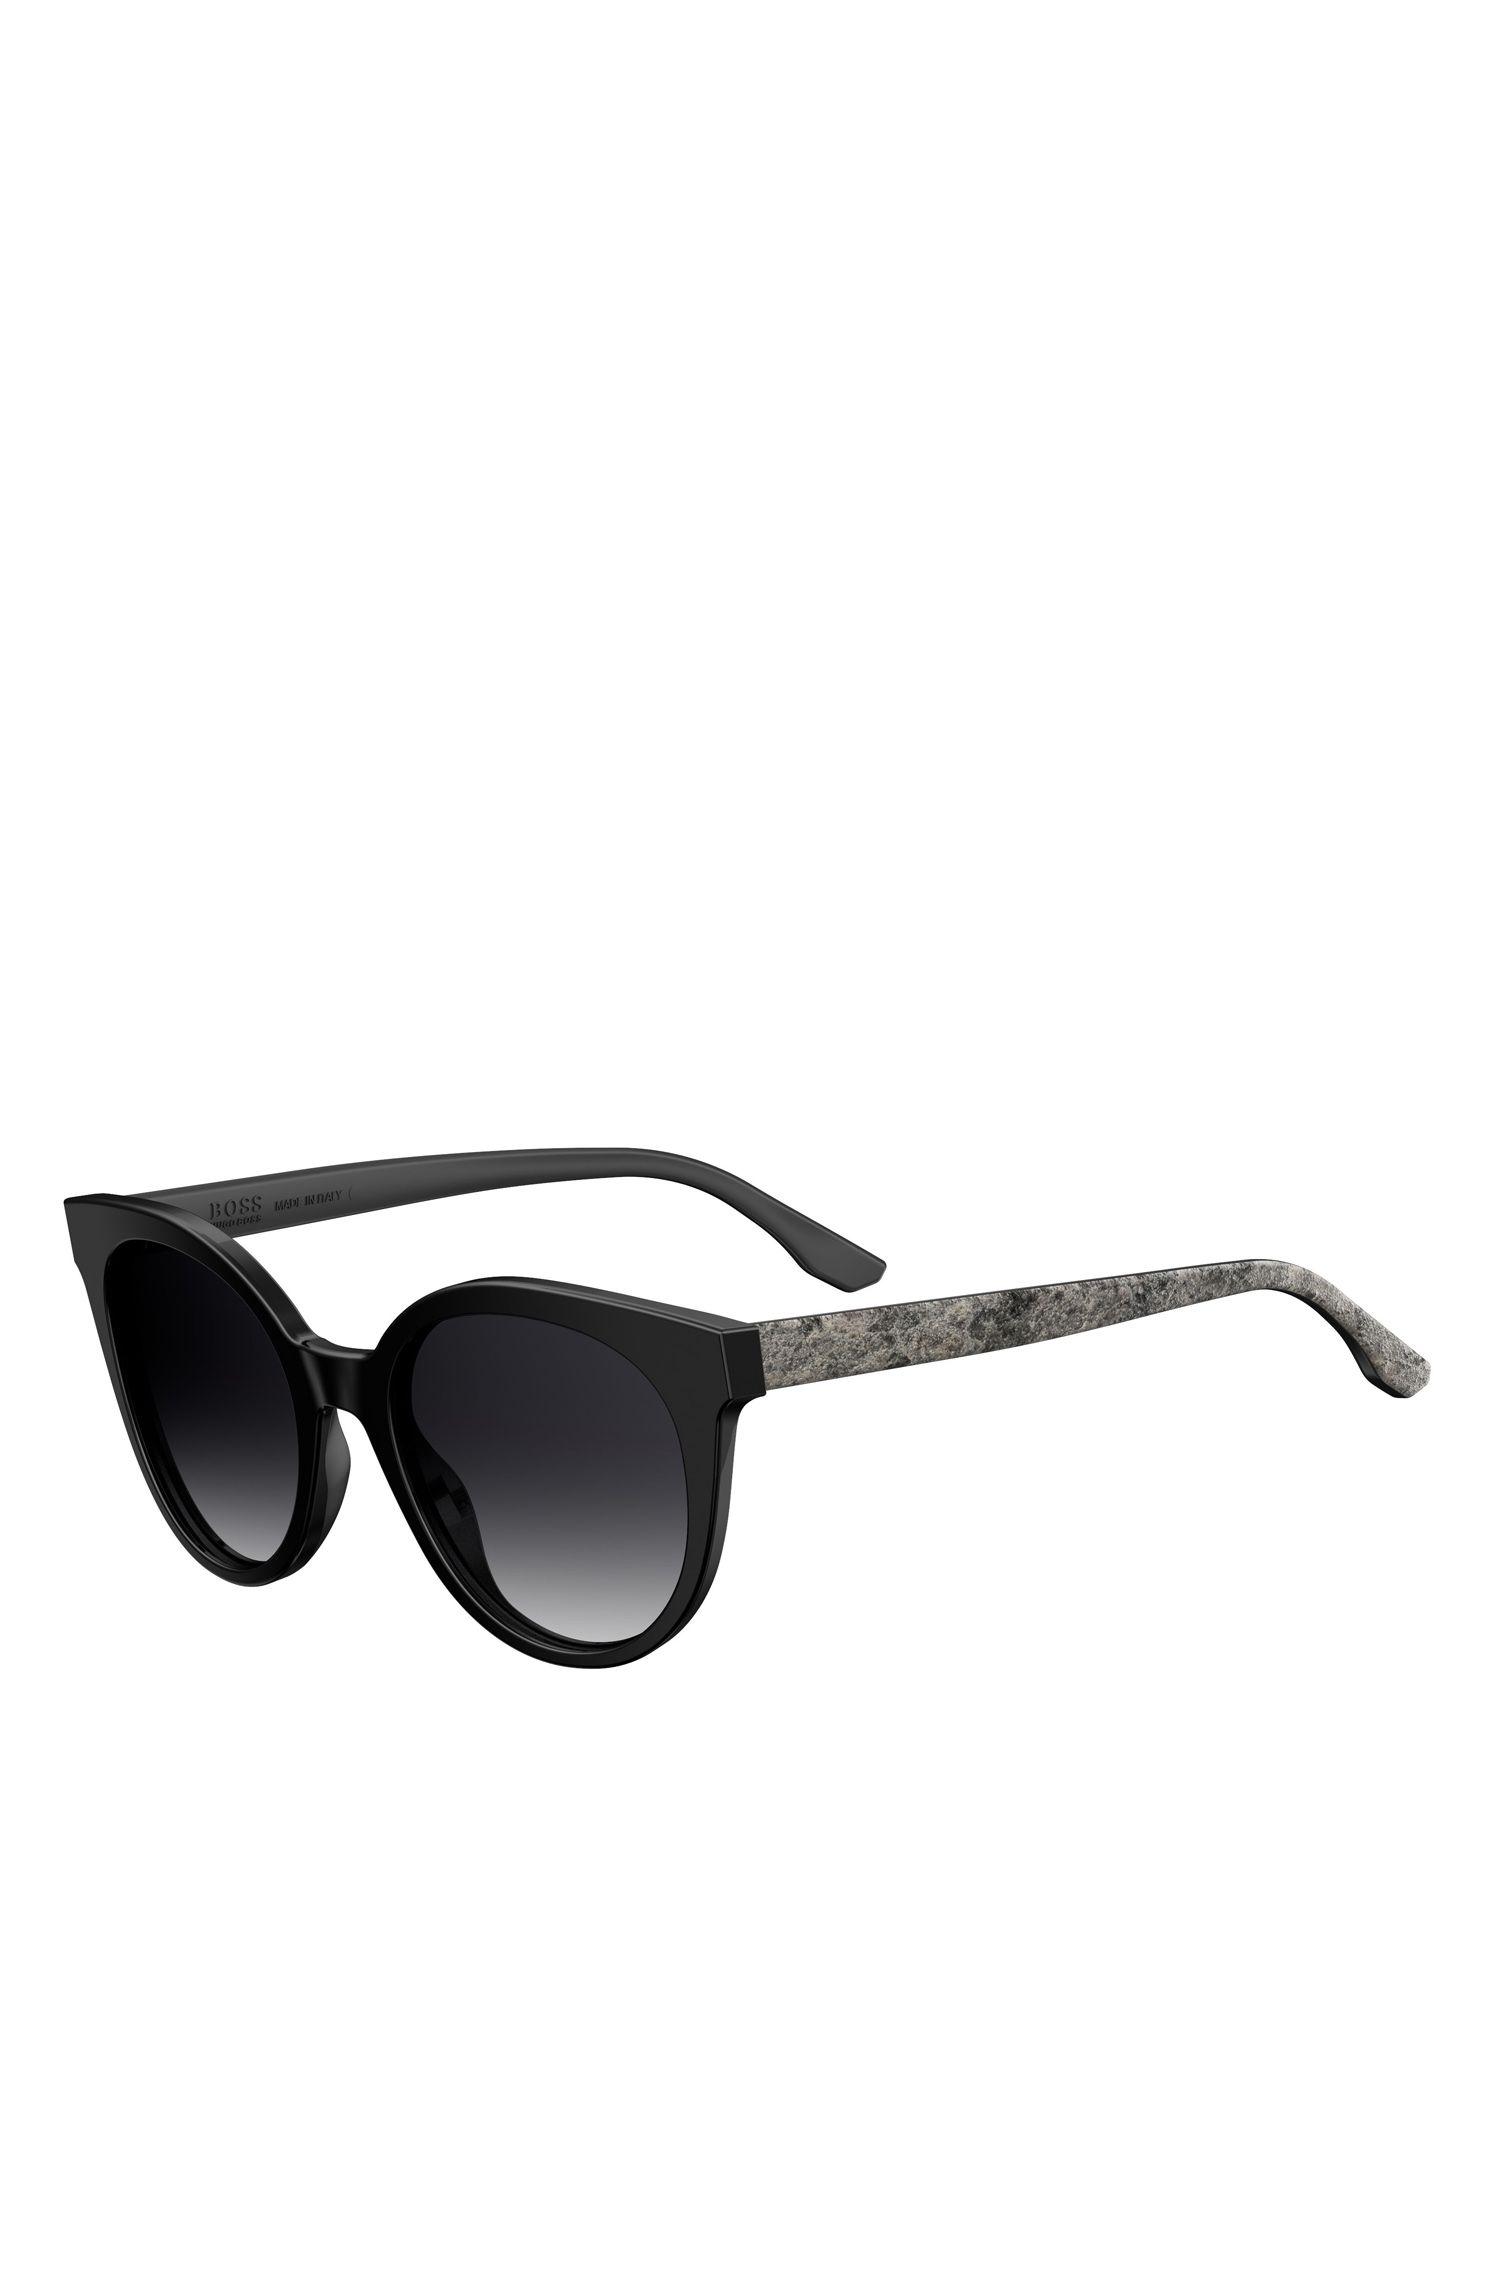 'BOSS 0890S' | Black Acetate Round Sunglasses